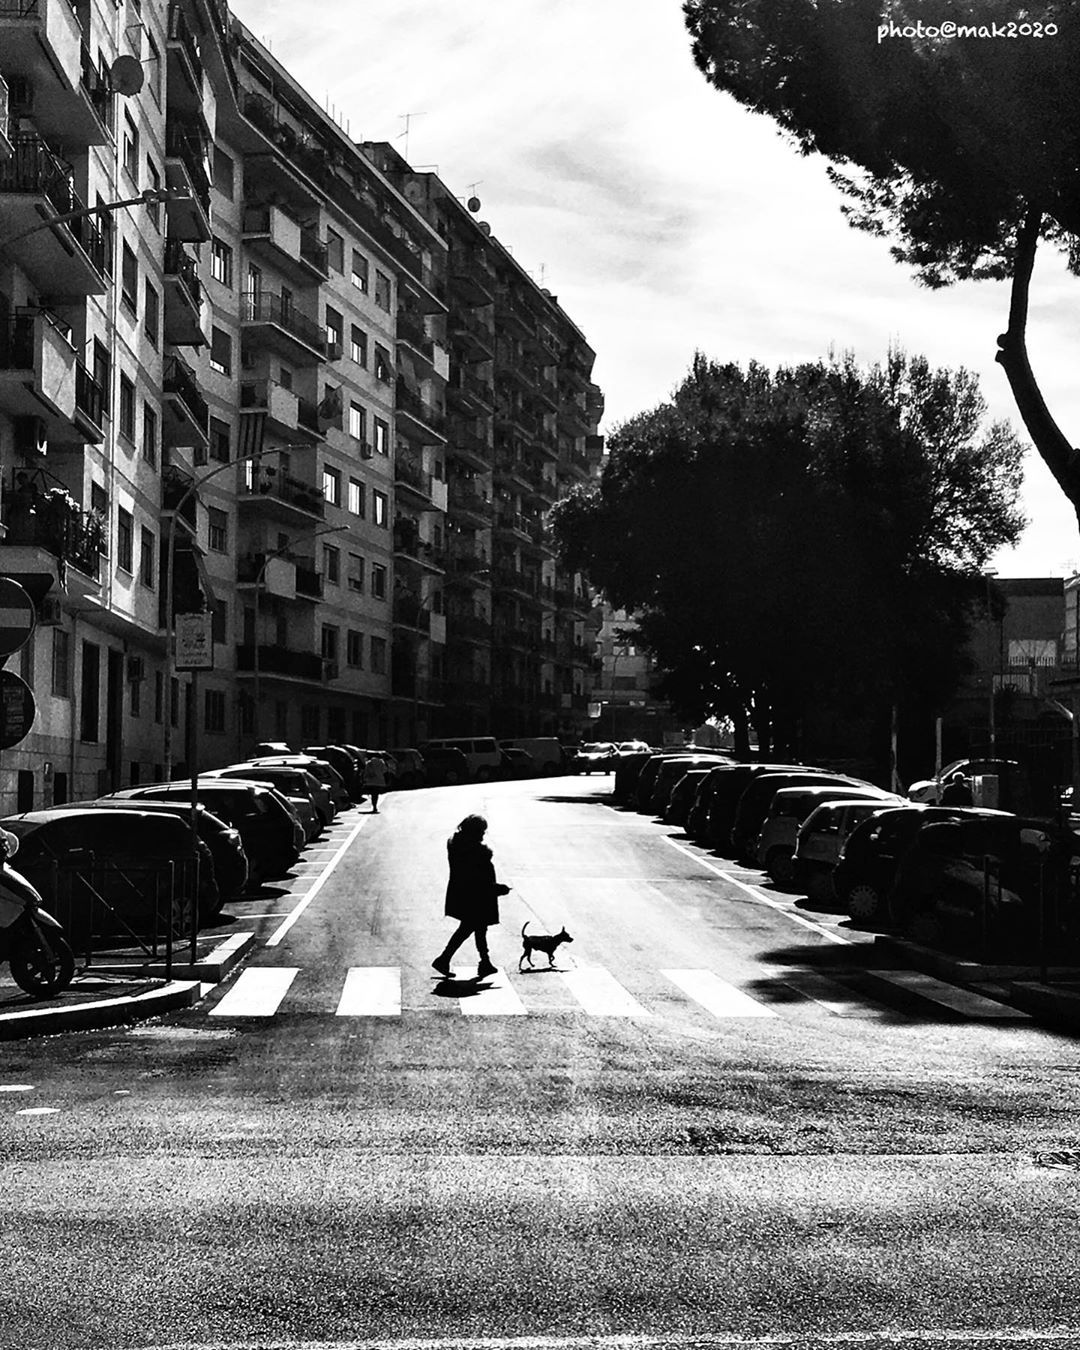 ATTRAVERSAMENTI #bnw #roma #rome #phonephotographer #iphonography #viasabaudia #dogsandwomen #stepbystepinrome #streetphotografyinternational #streetview #phonephotography #streetlife #grigio18 #phonecamera #zonestreet #streetcapture #streetphotographer #cornerofthecity #capturestreets #capturestreetshot #instashot #mobile_photography #iphone6splus #monochromatic #mobilephotography #streetfeat #streetphotographyintheworld #visionofpicture #corsofotografico #blackandwhitephotography